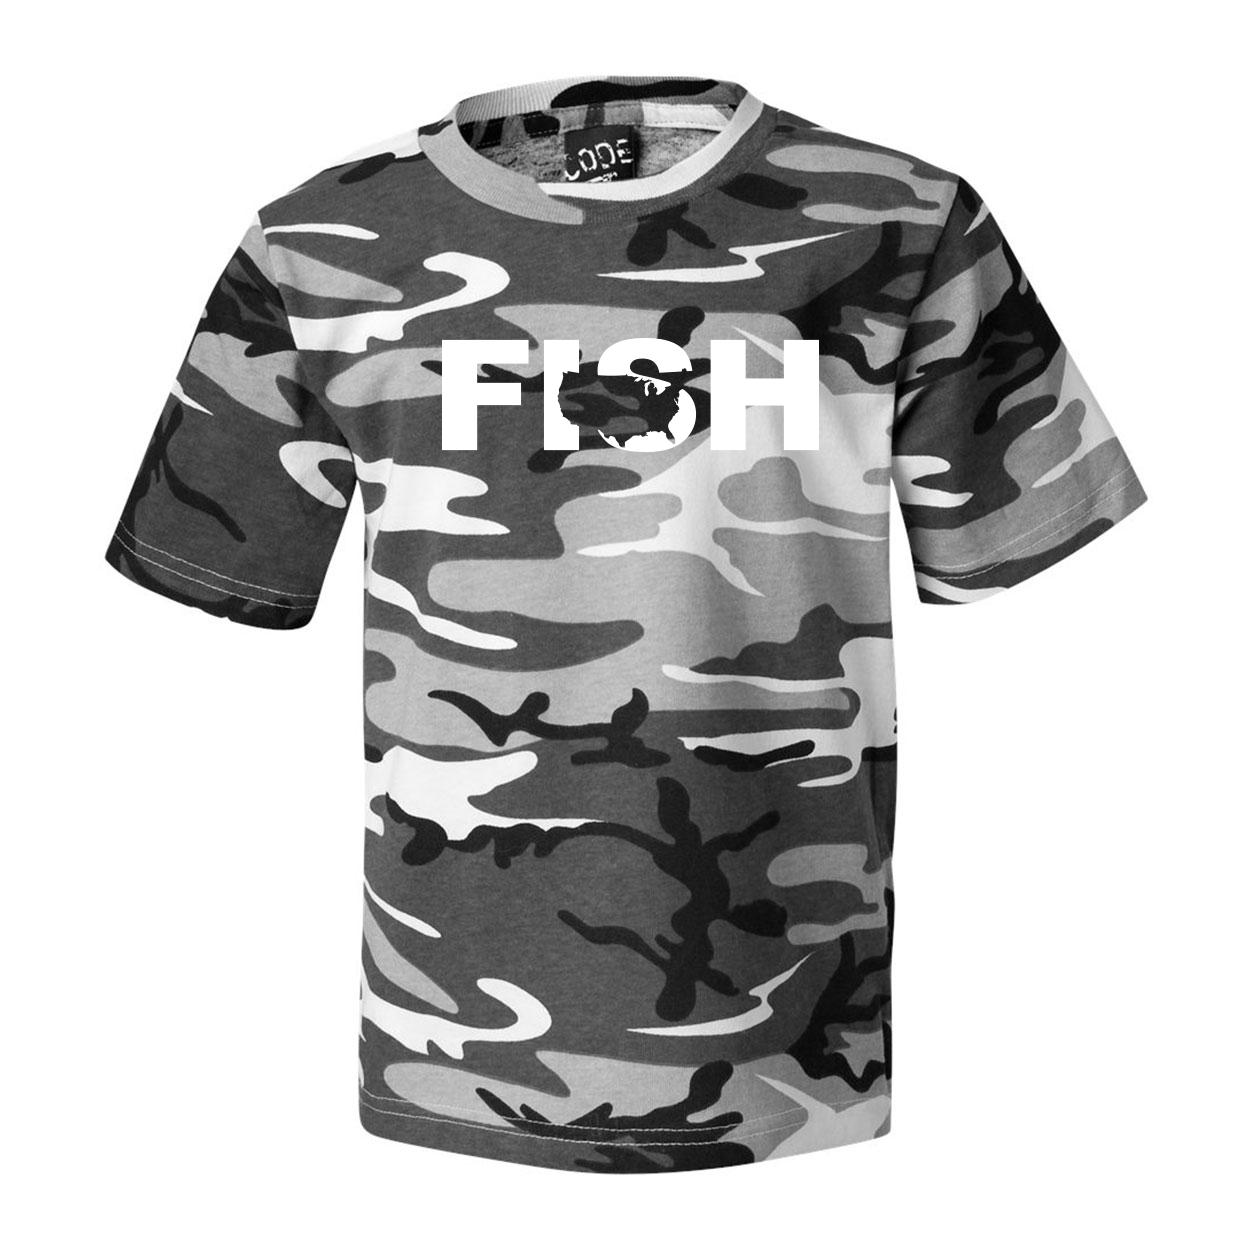 Fish United States Classic Premium T-Shirt Urban Camo (White Logo)